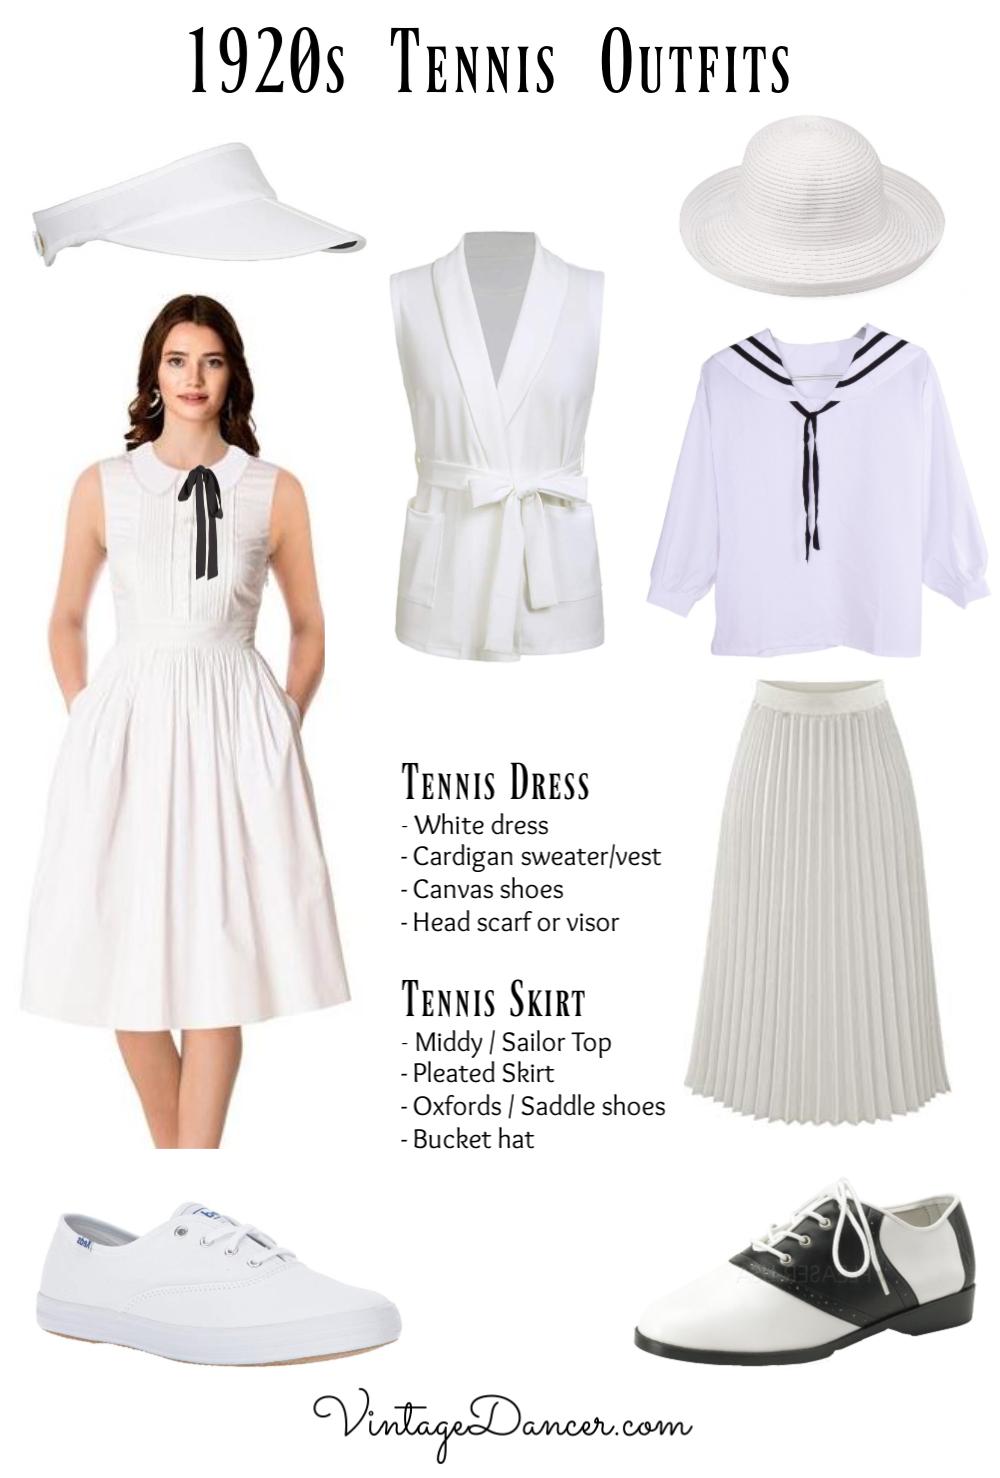 1920s Tennis Outfit Tennis Clothes 20s Tennis Dress Ideas Diy At Vintagedancer Com 1920s Outfits 1920s Fashion Fashion [ 1478 x 1000 Pixel ]